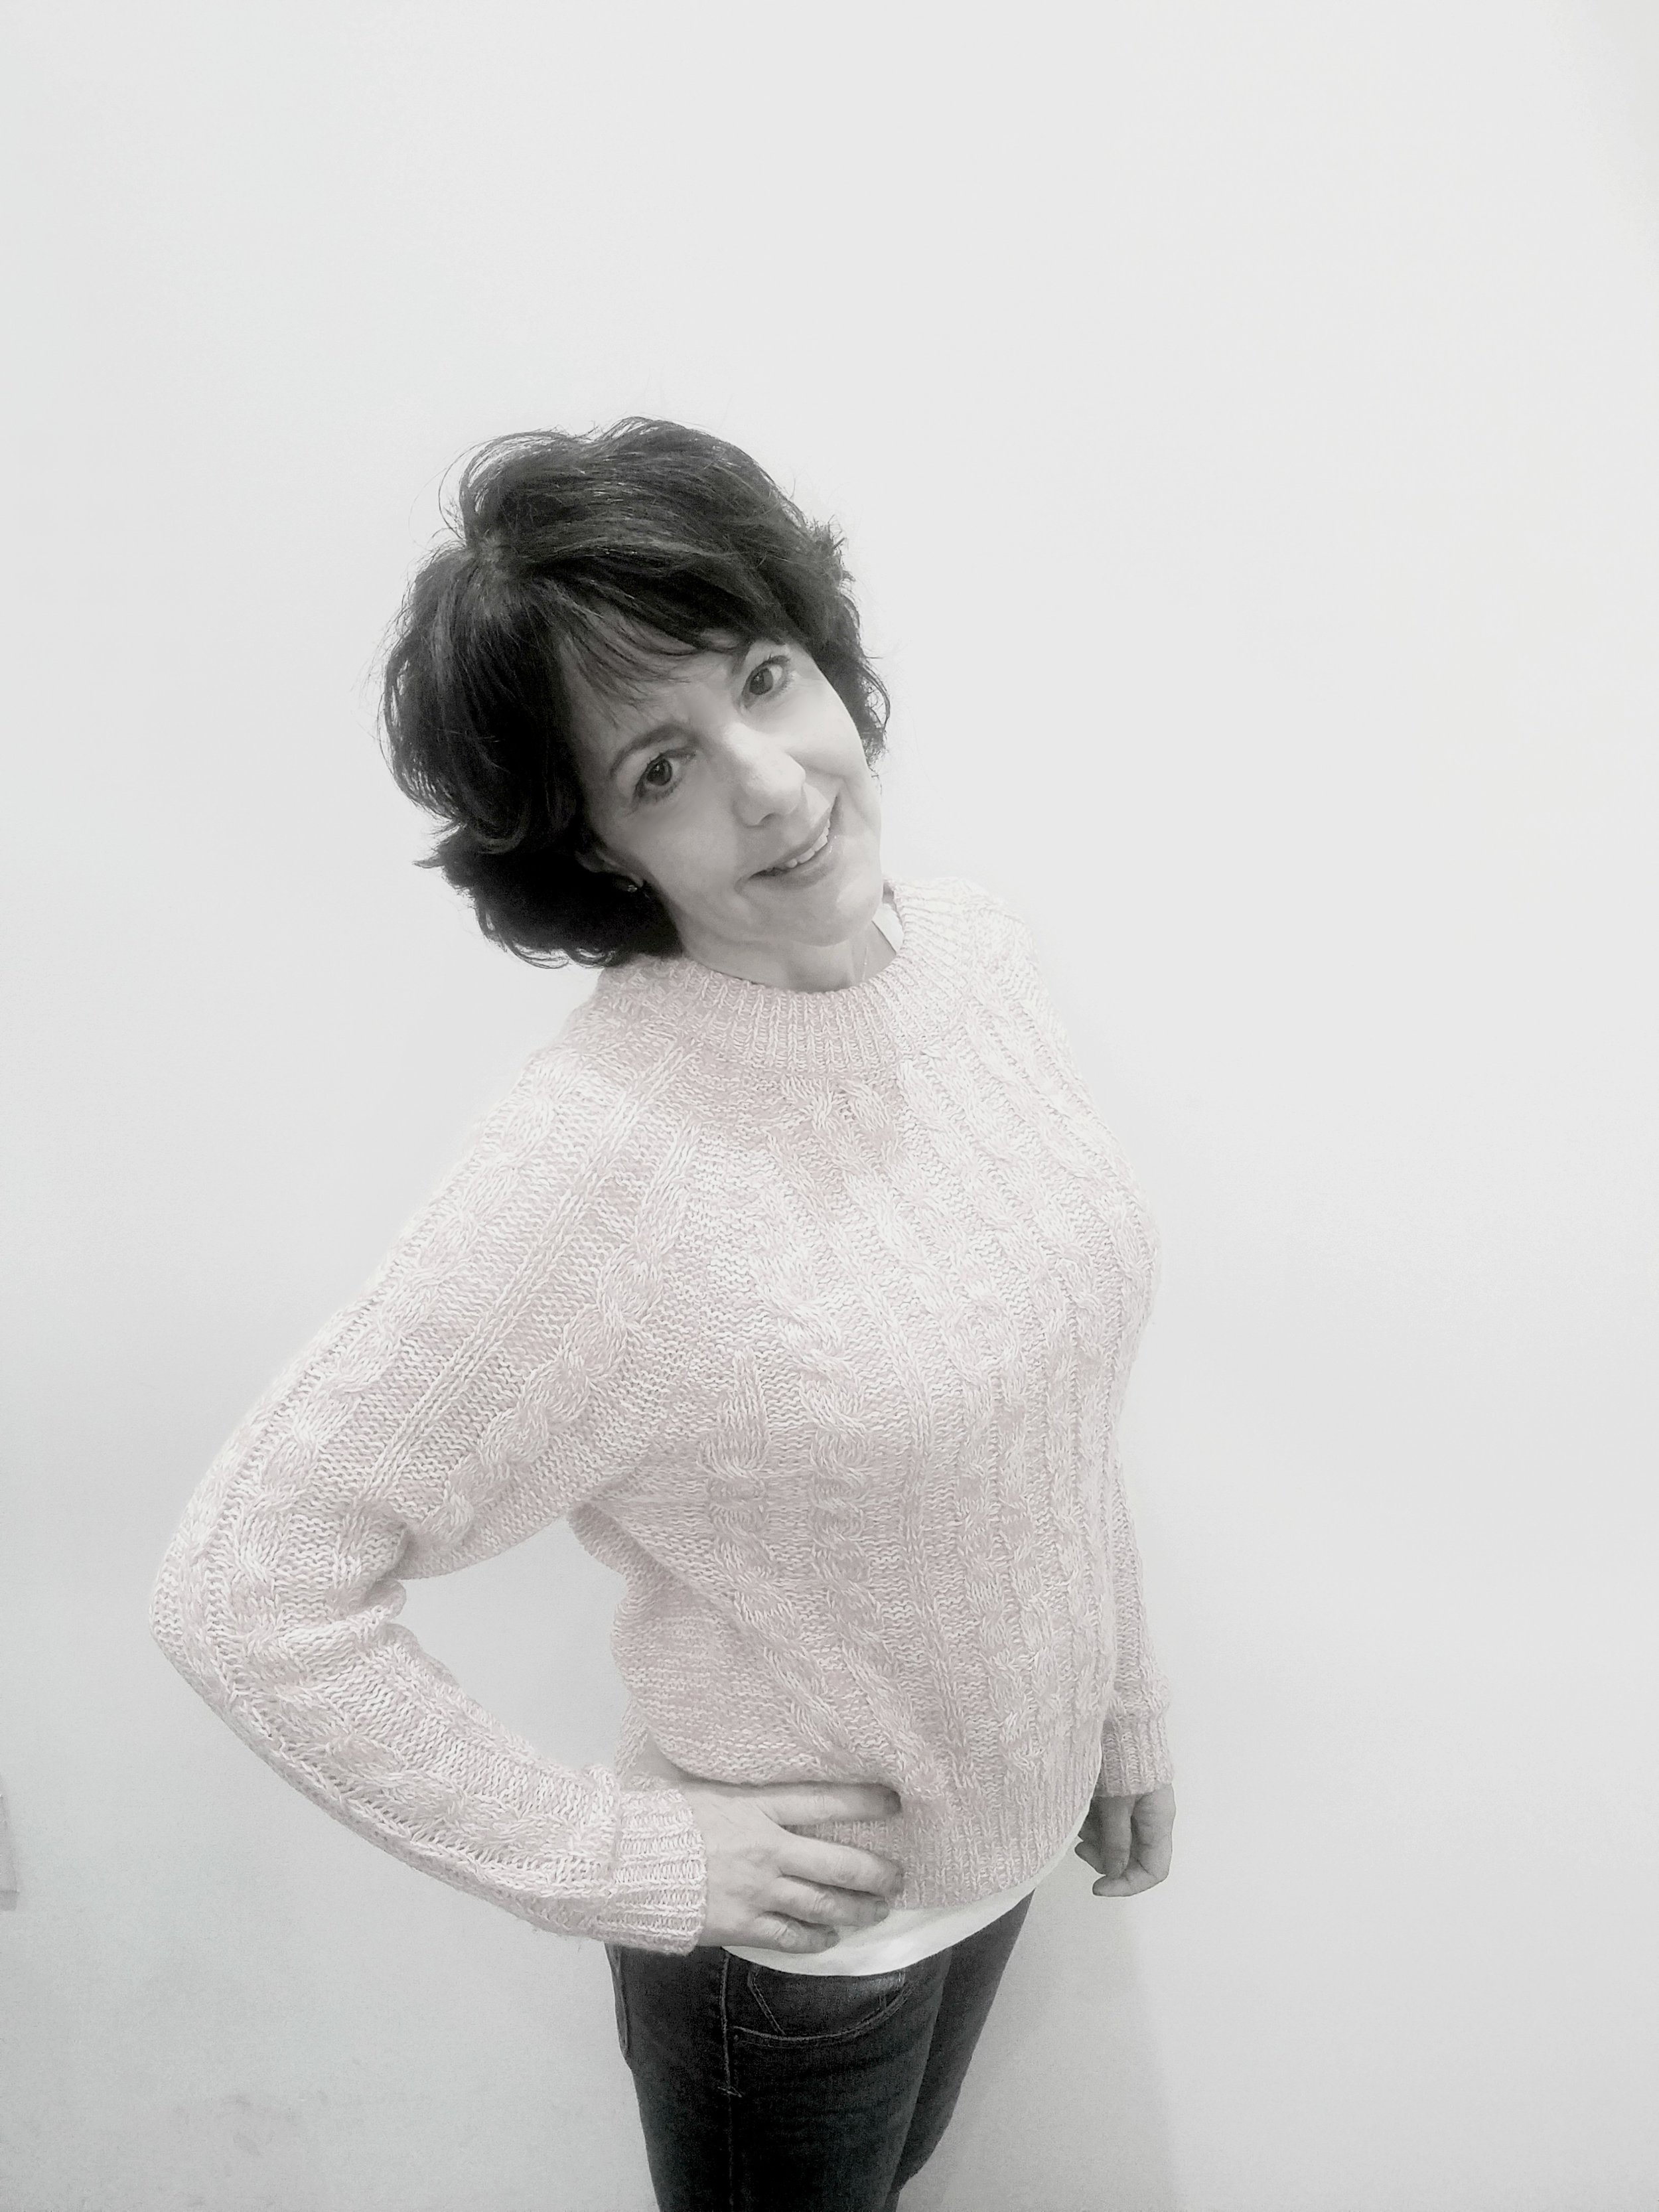 Lauren Capaldi - HairstylistFrom Providence, RI